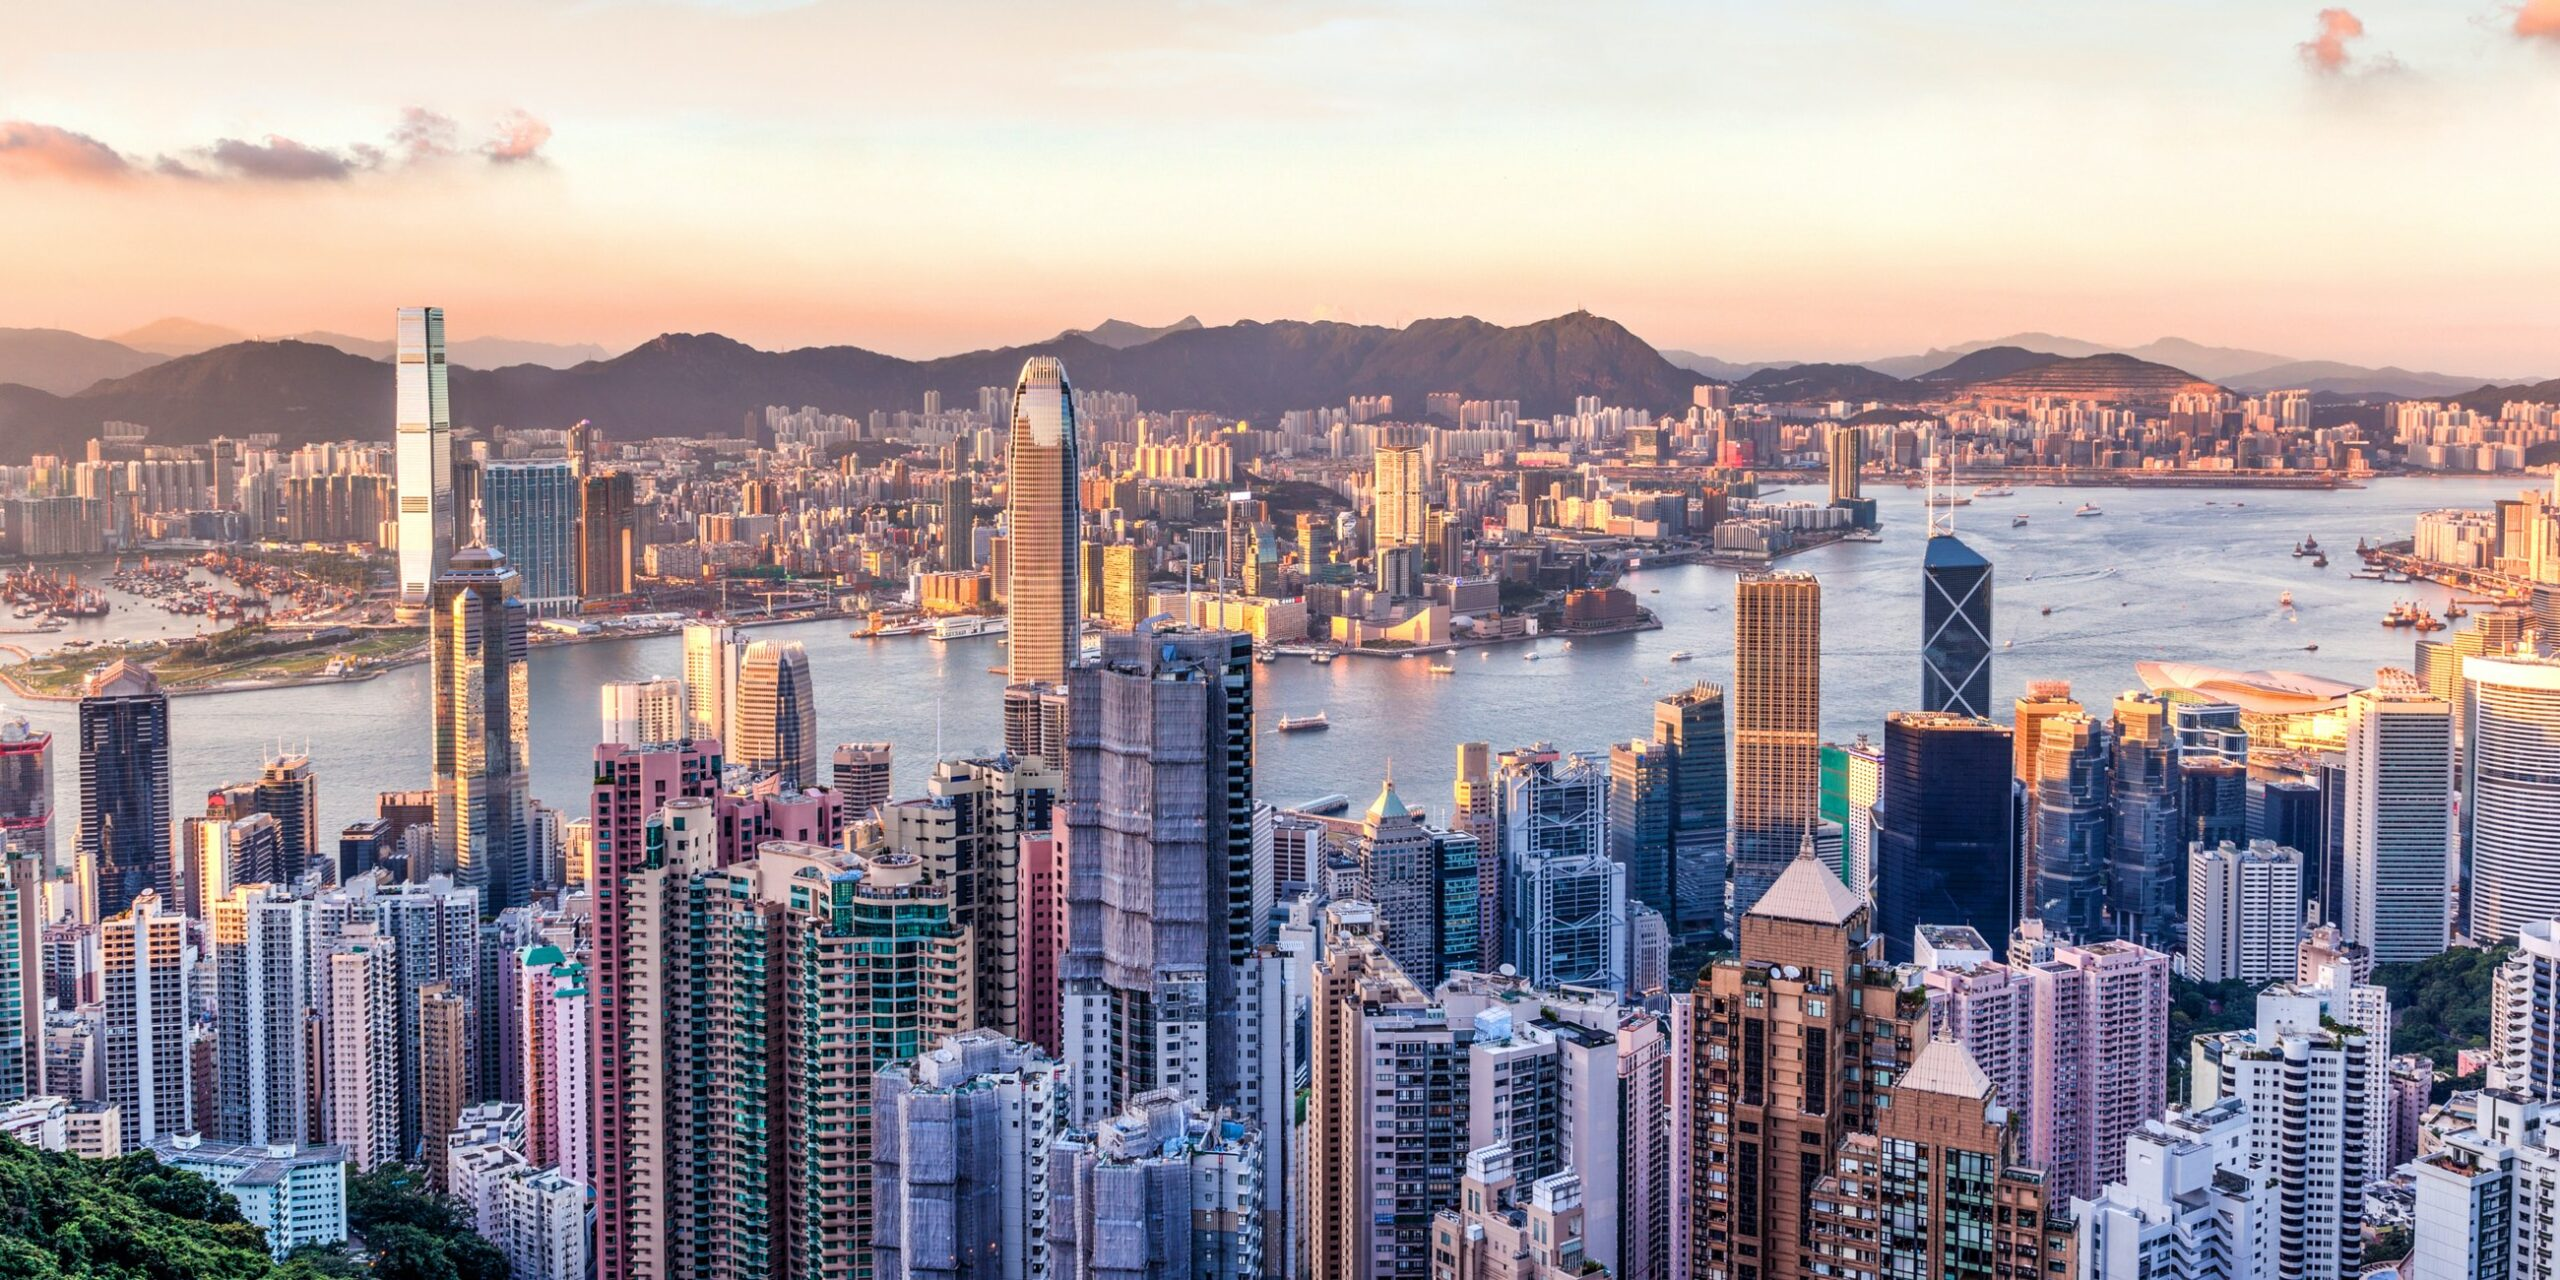 Enter-the-Dragon-Hong-Kong-the-best-bits